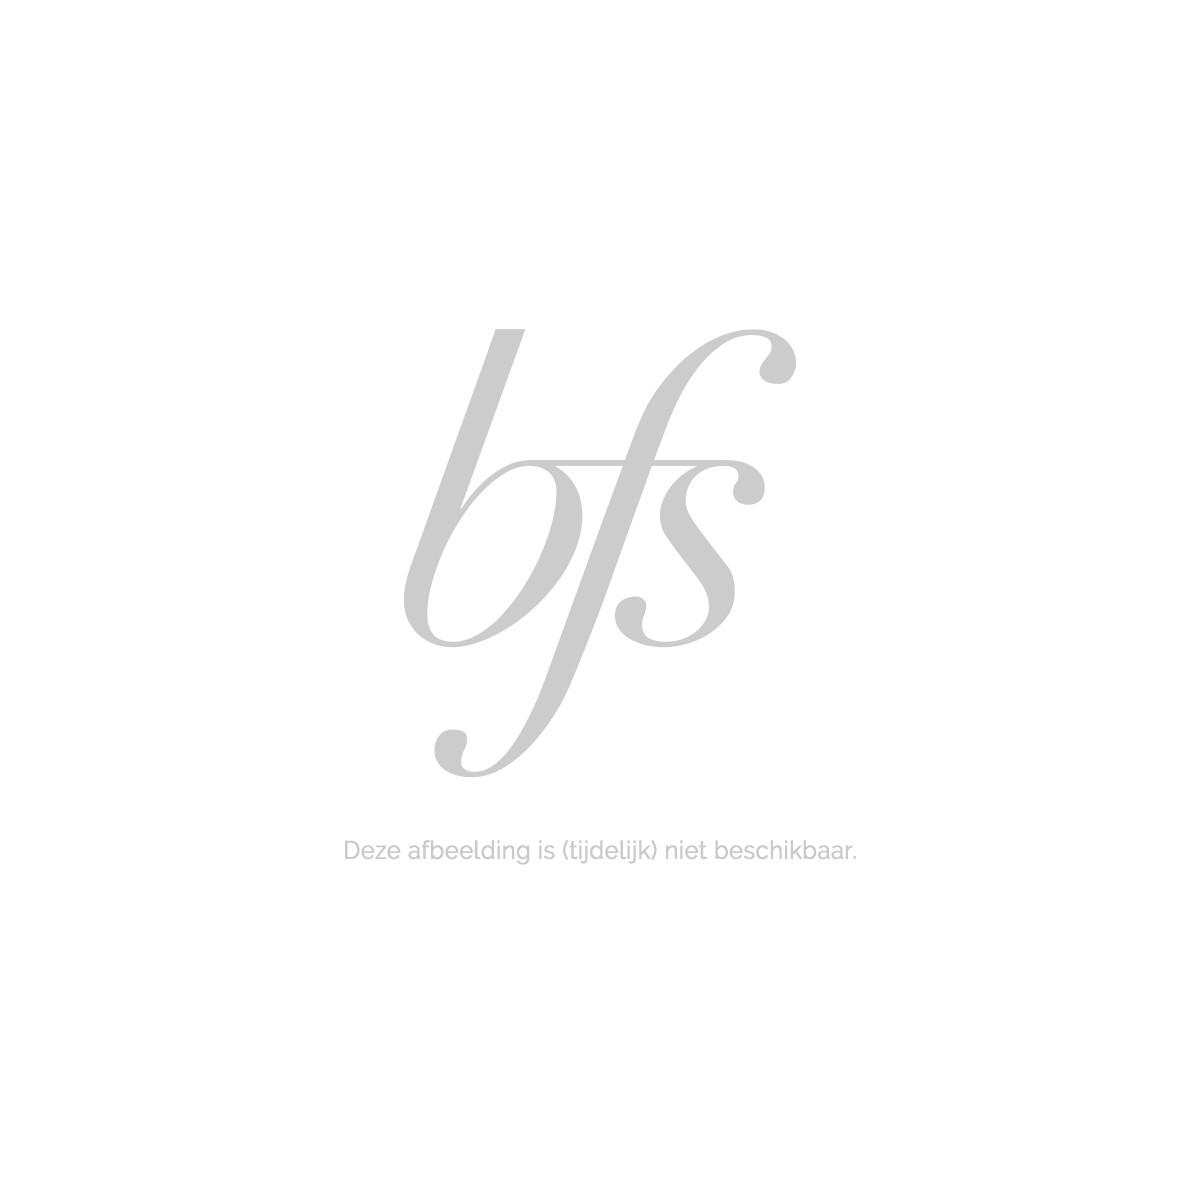 Guerlain Cils DEnfer Maxi Lash Mascara #01 Noir Curl Sculpting 8,5 Ml